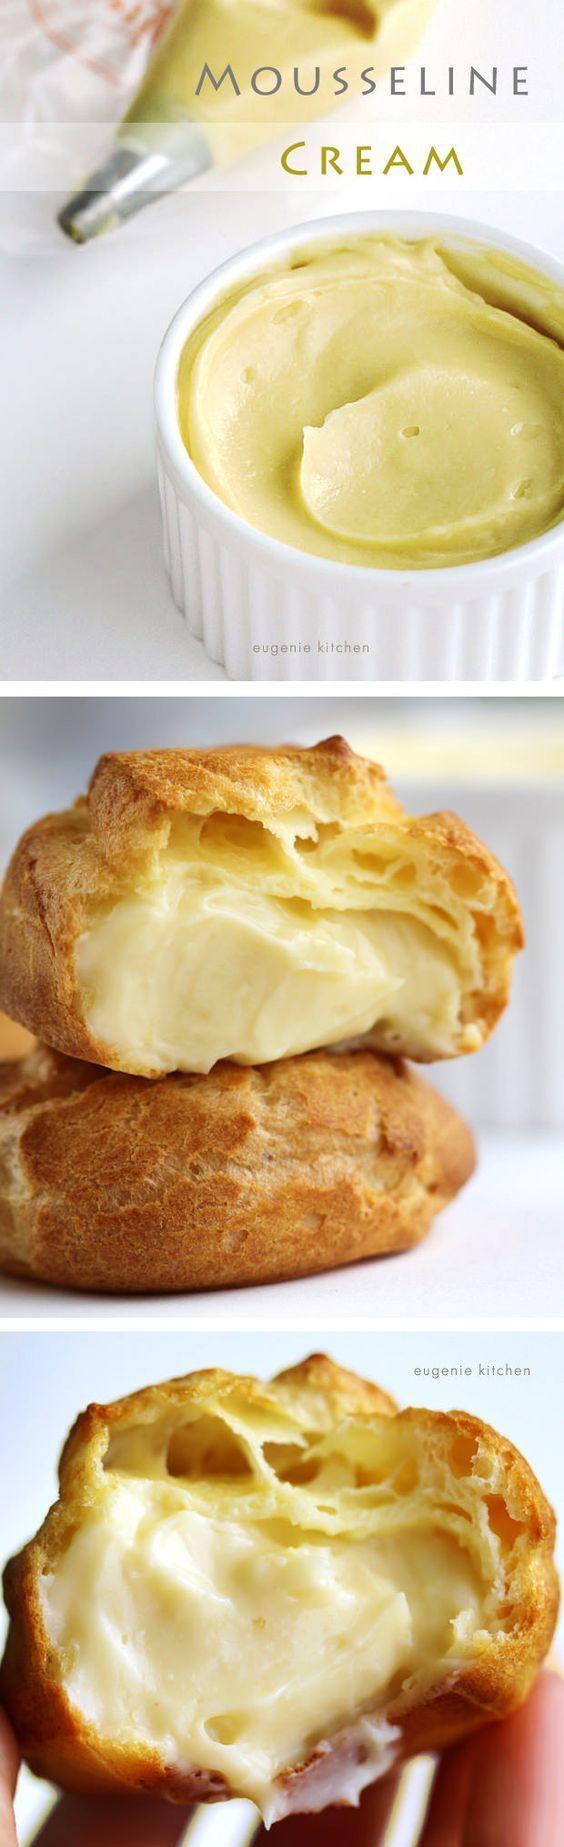 ❤️Mousseline cream filled cream puffs!❤️:                                                                                                                                                     More